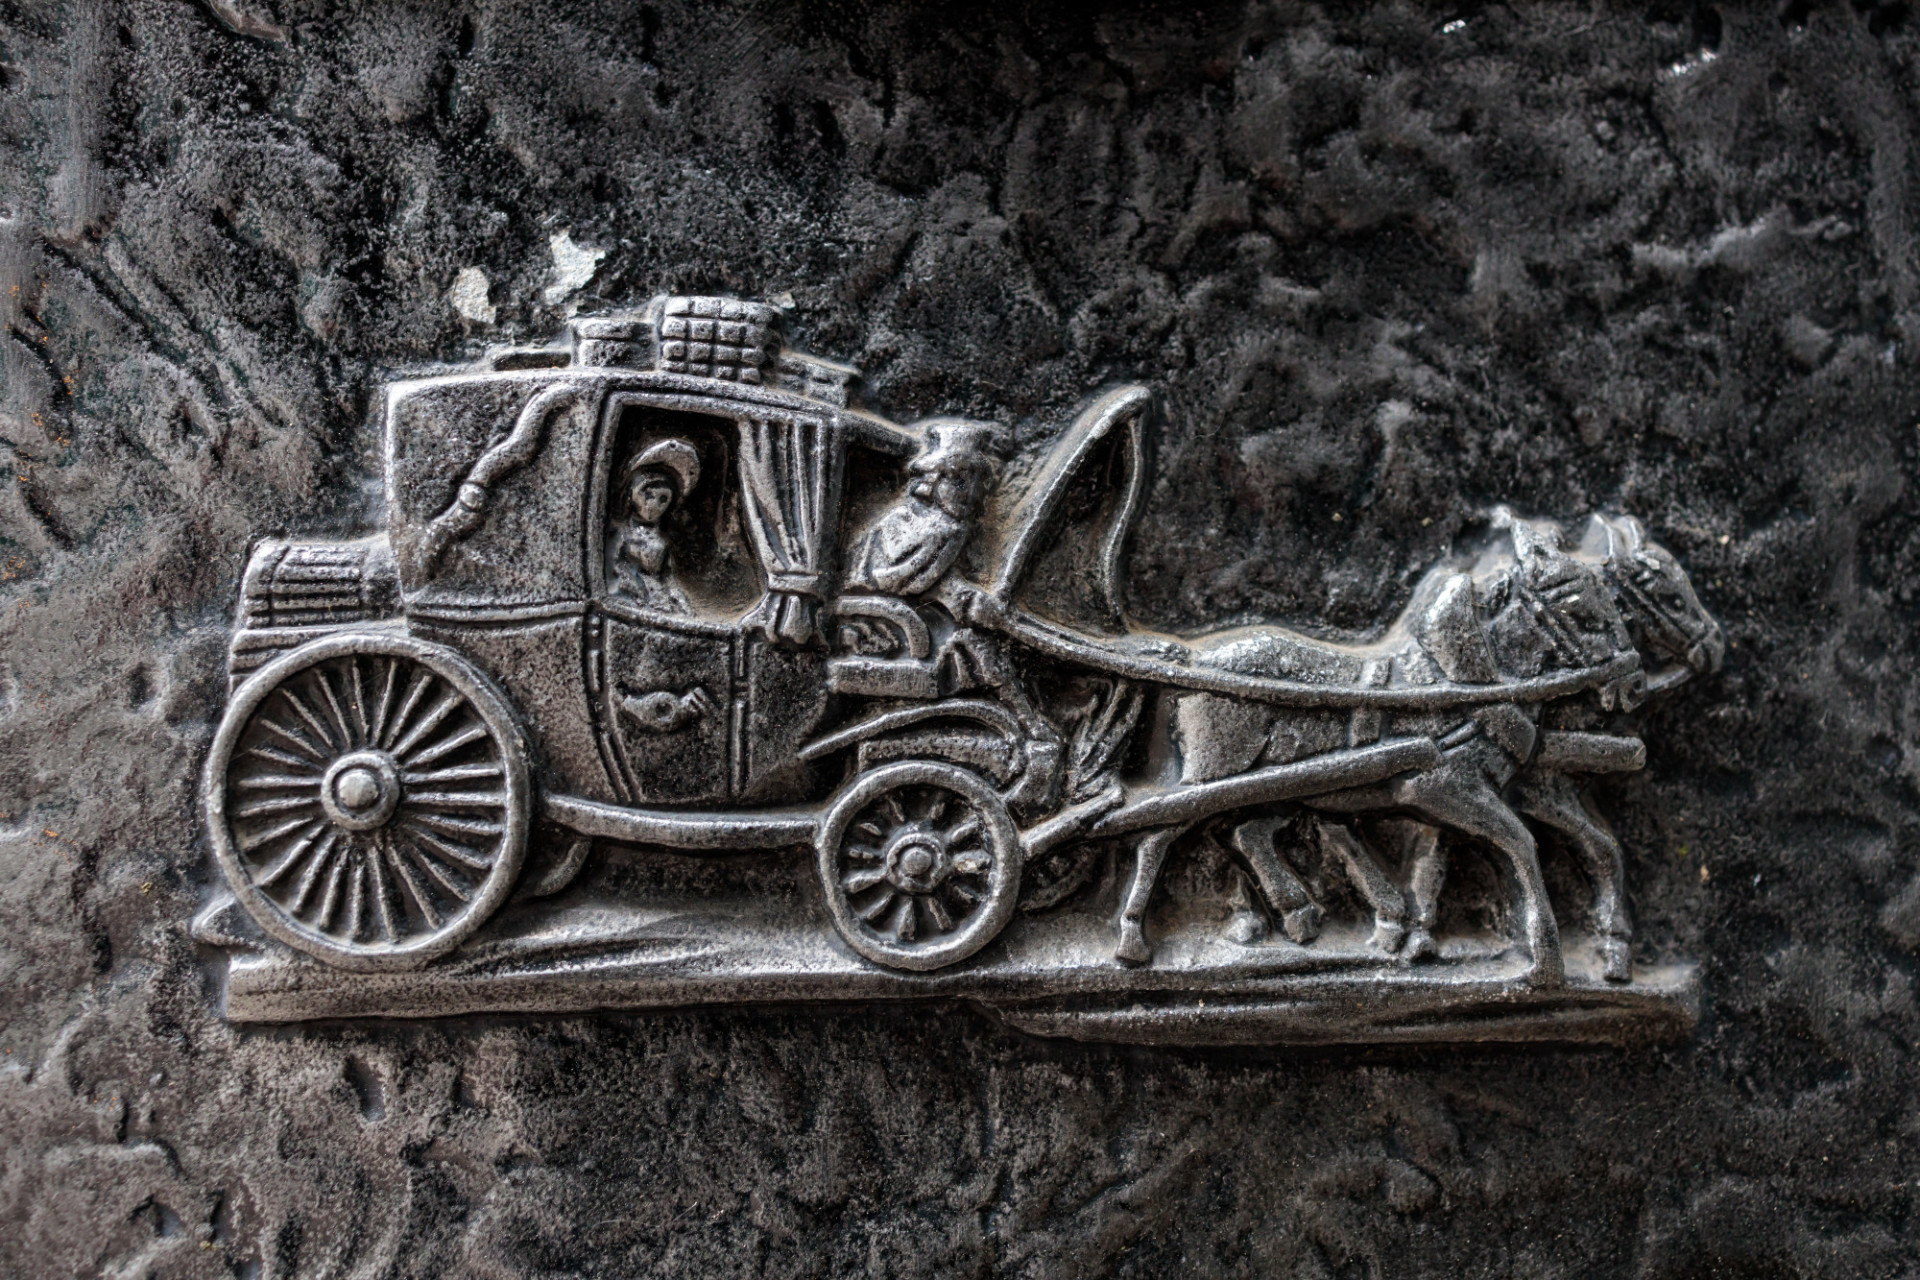 Stagecoach metal symbol